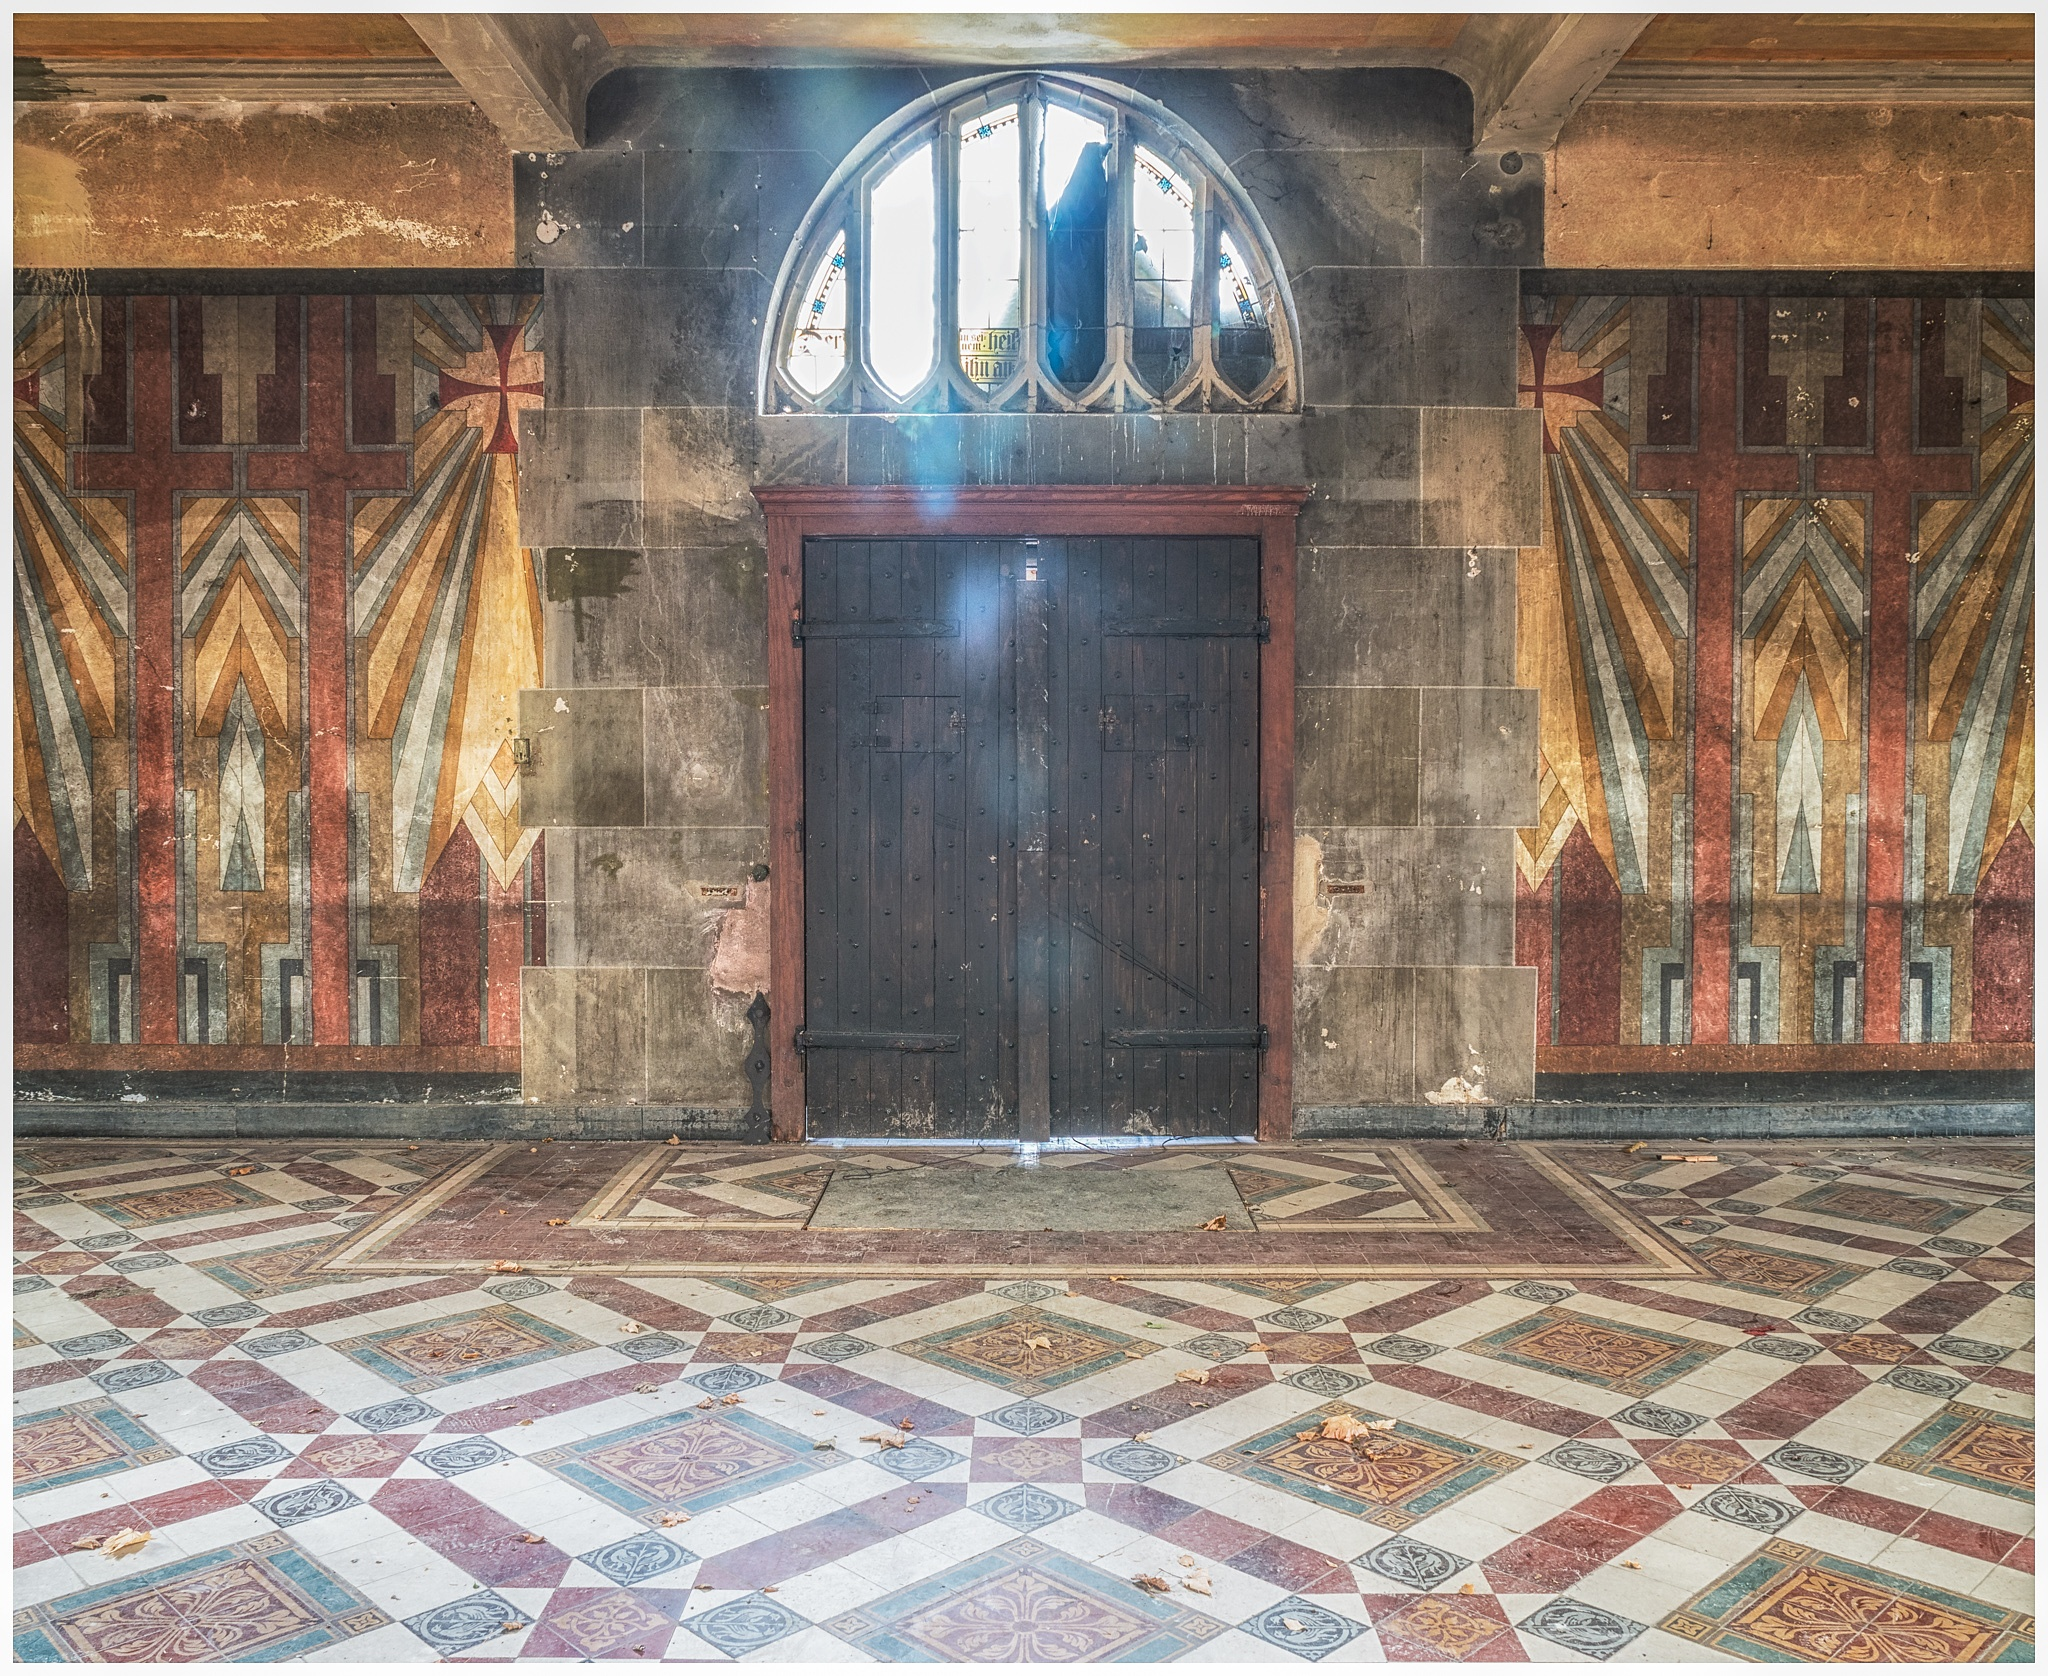 St. Josefsheim, chapel (5) by esmeralda.holman